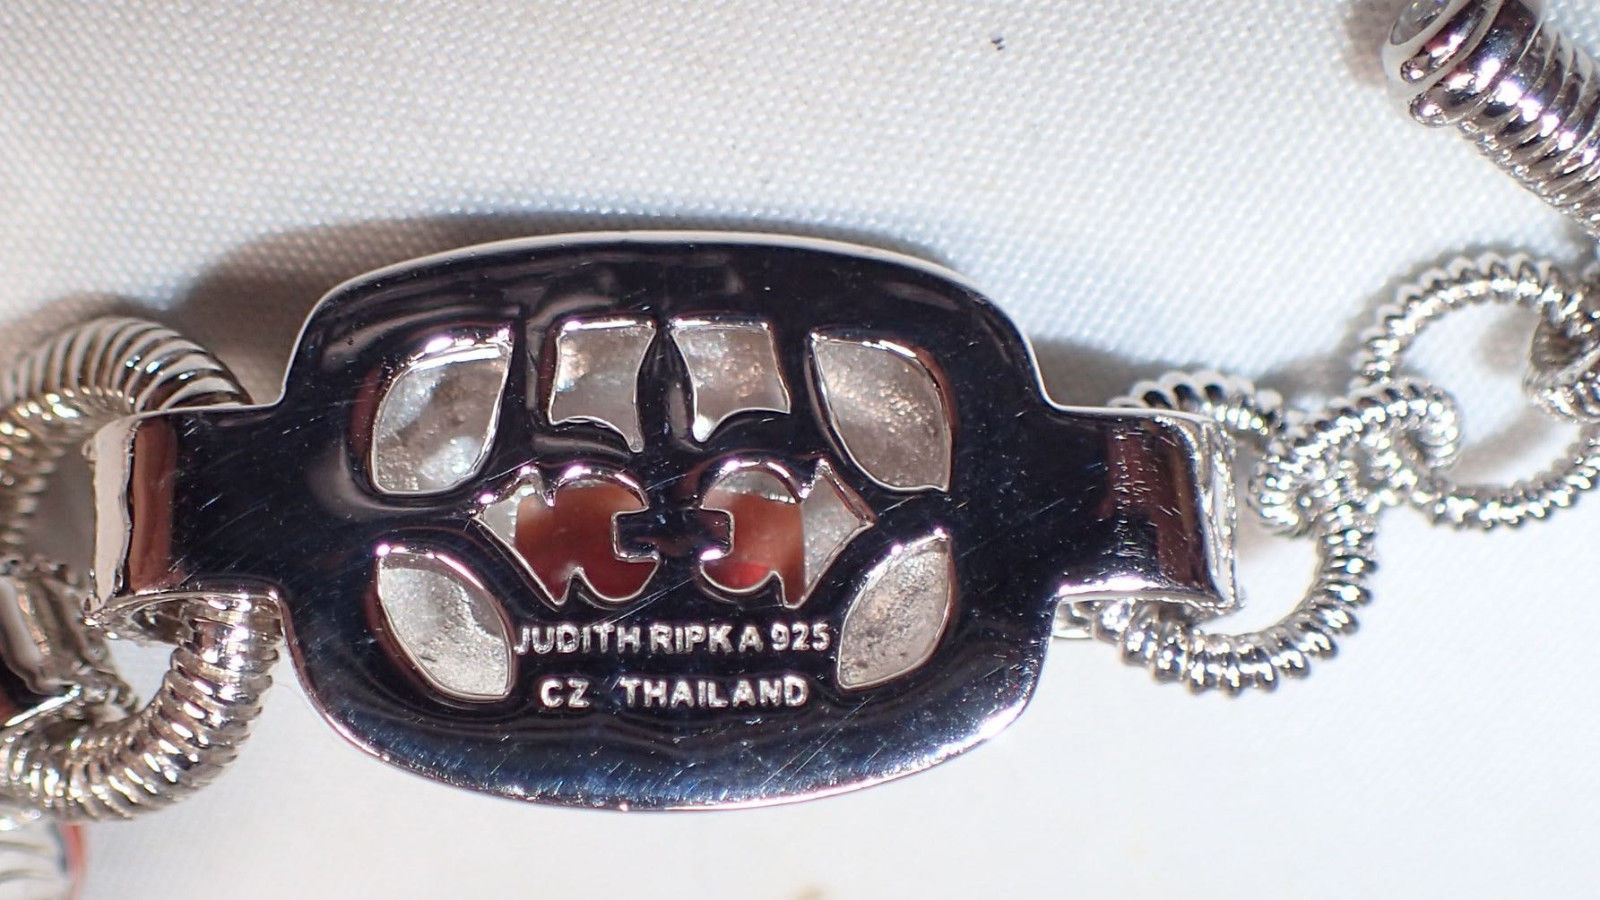 Judith Ripka Sterling Silver Carved Jasper CZ Station Link Bracelet New in Box image 3